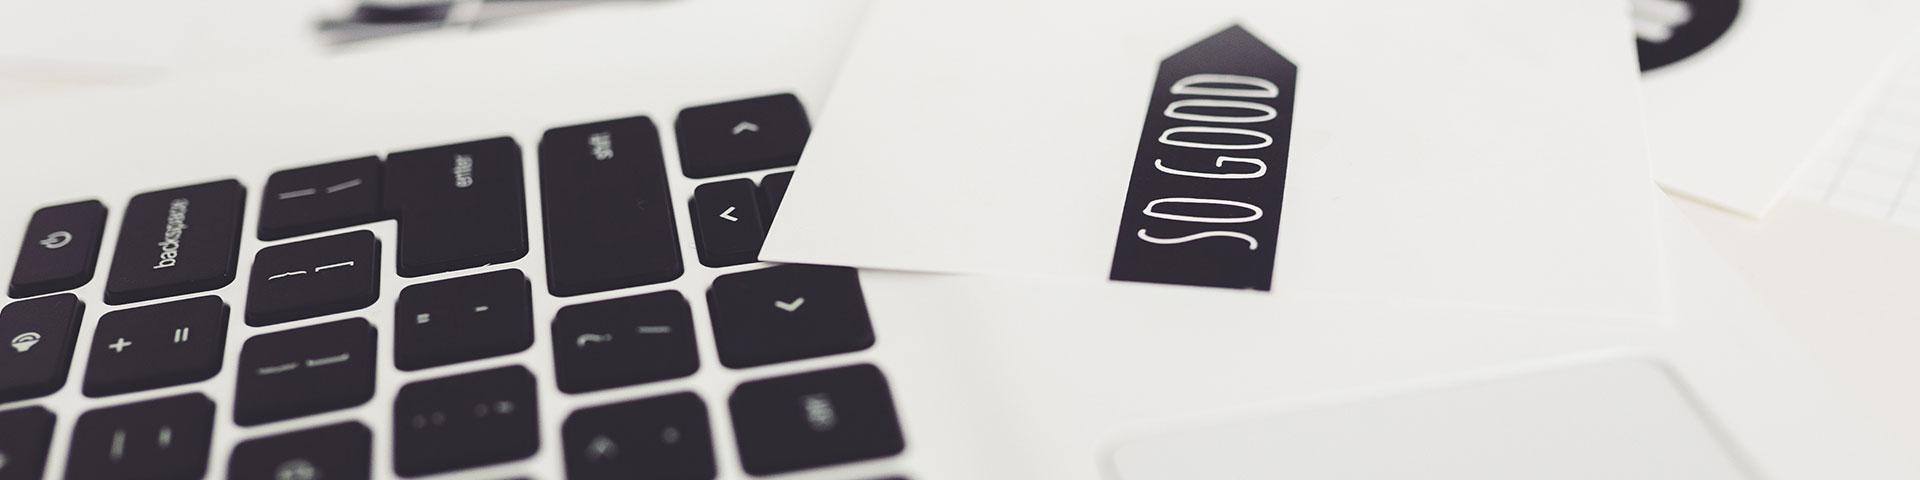 Wordpress продвижение сайта продвижение web сайтов в интернете